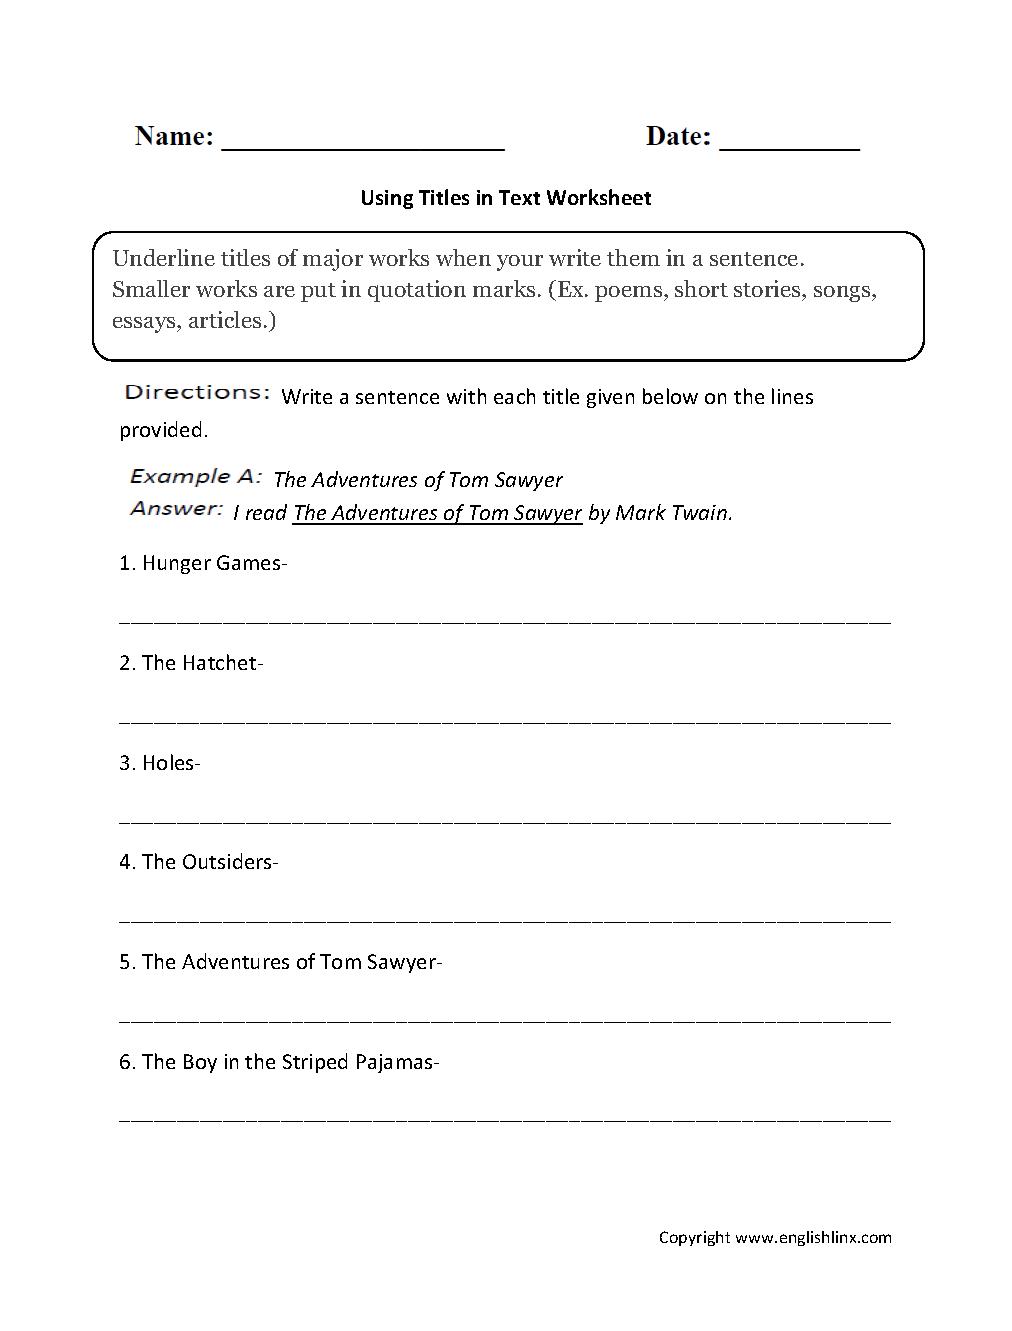 Using Titles In Text Worksheets Grammar Mechanics Letter Worksheets For Preschool Punctuation Worksheets [ 1331 x 1012 Pixel ]